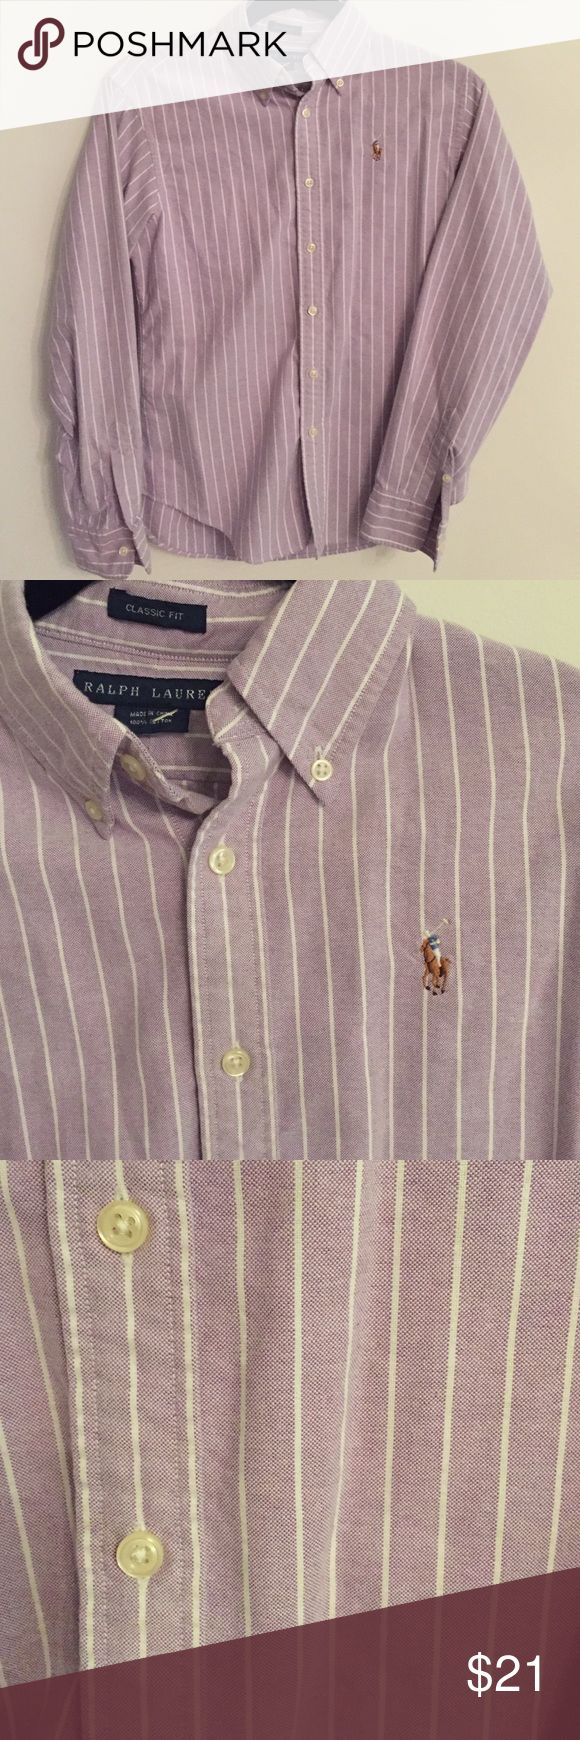 Ralph Lauren purple pinstriped oxford Classic fit button down women's top. Light purple with white stripes Ralph Lauren Tops Button Down Shirts